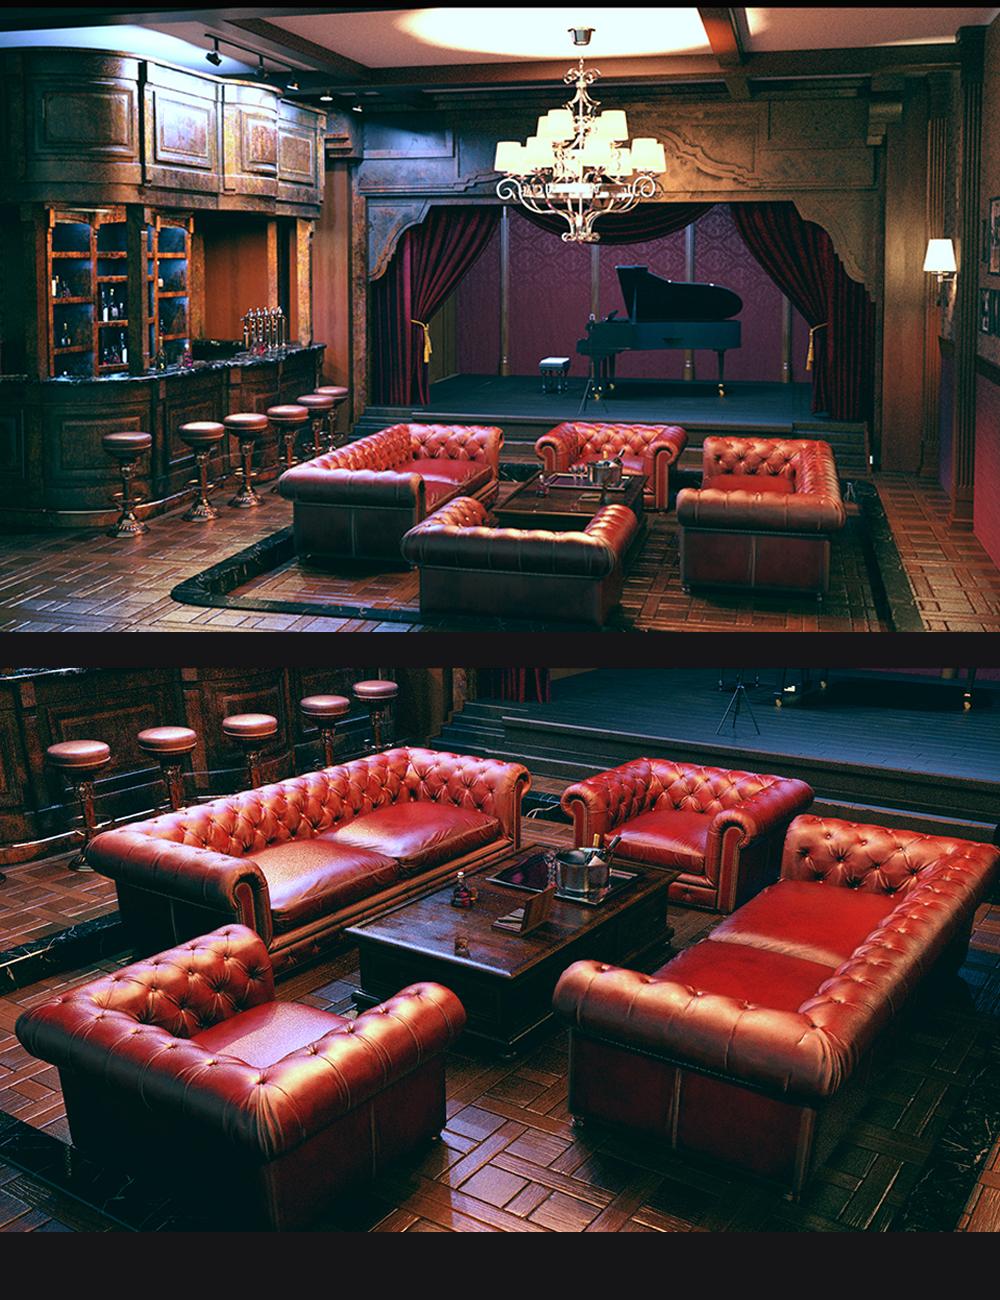 Mafia Private Bar by: Polish, 3D Models by Daz 3D